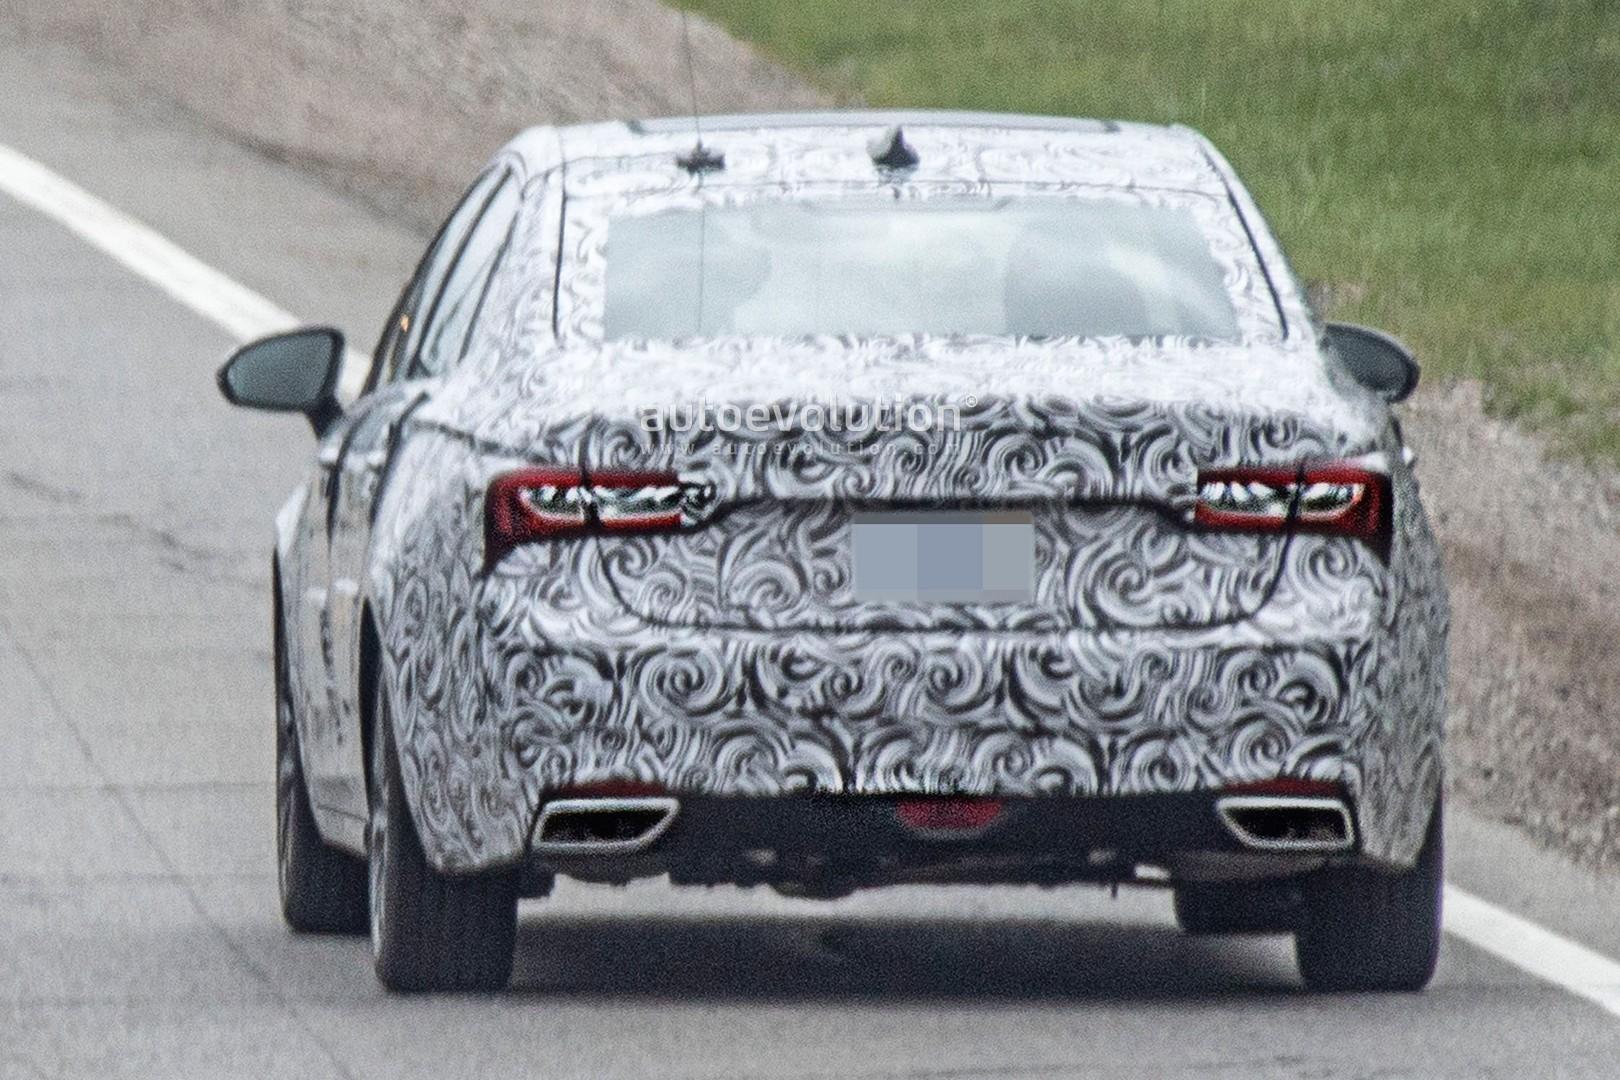 2020 Buick Verano Sedan Spied Testing In Michigan But Is